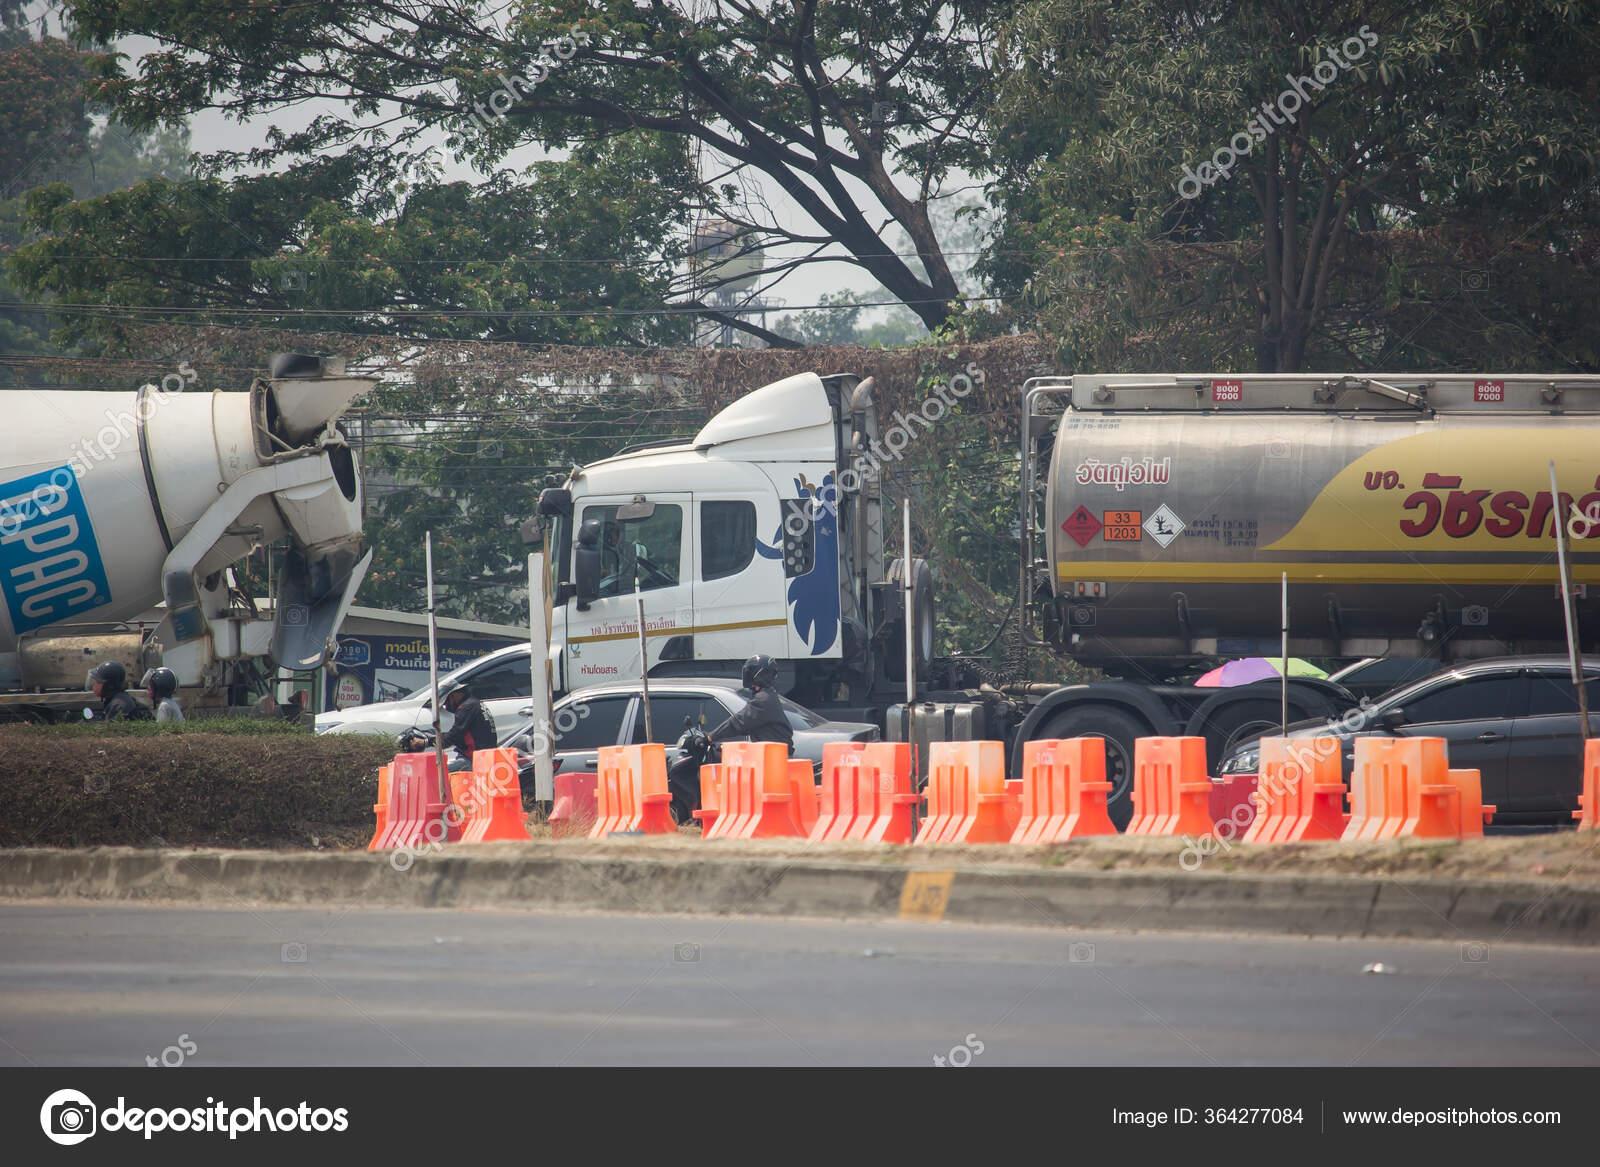 оперативно турция нефть грузовики фото несколько причин развития